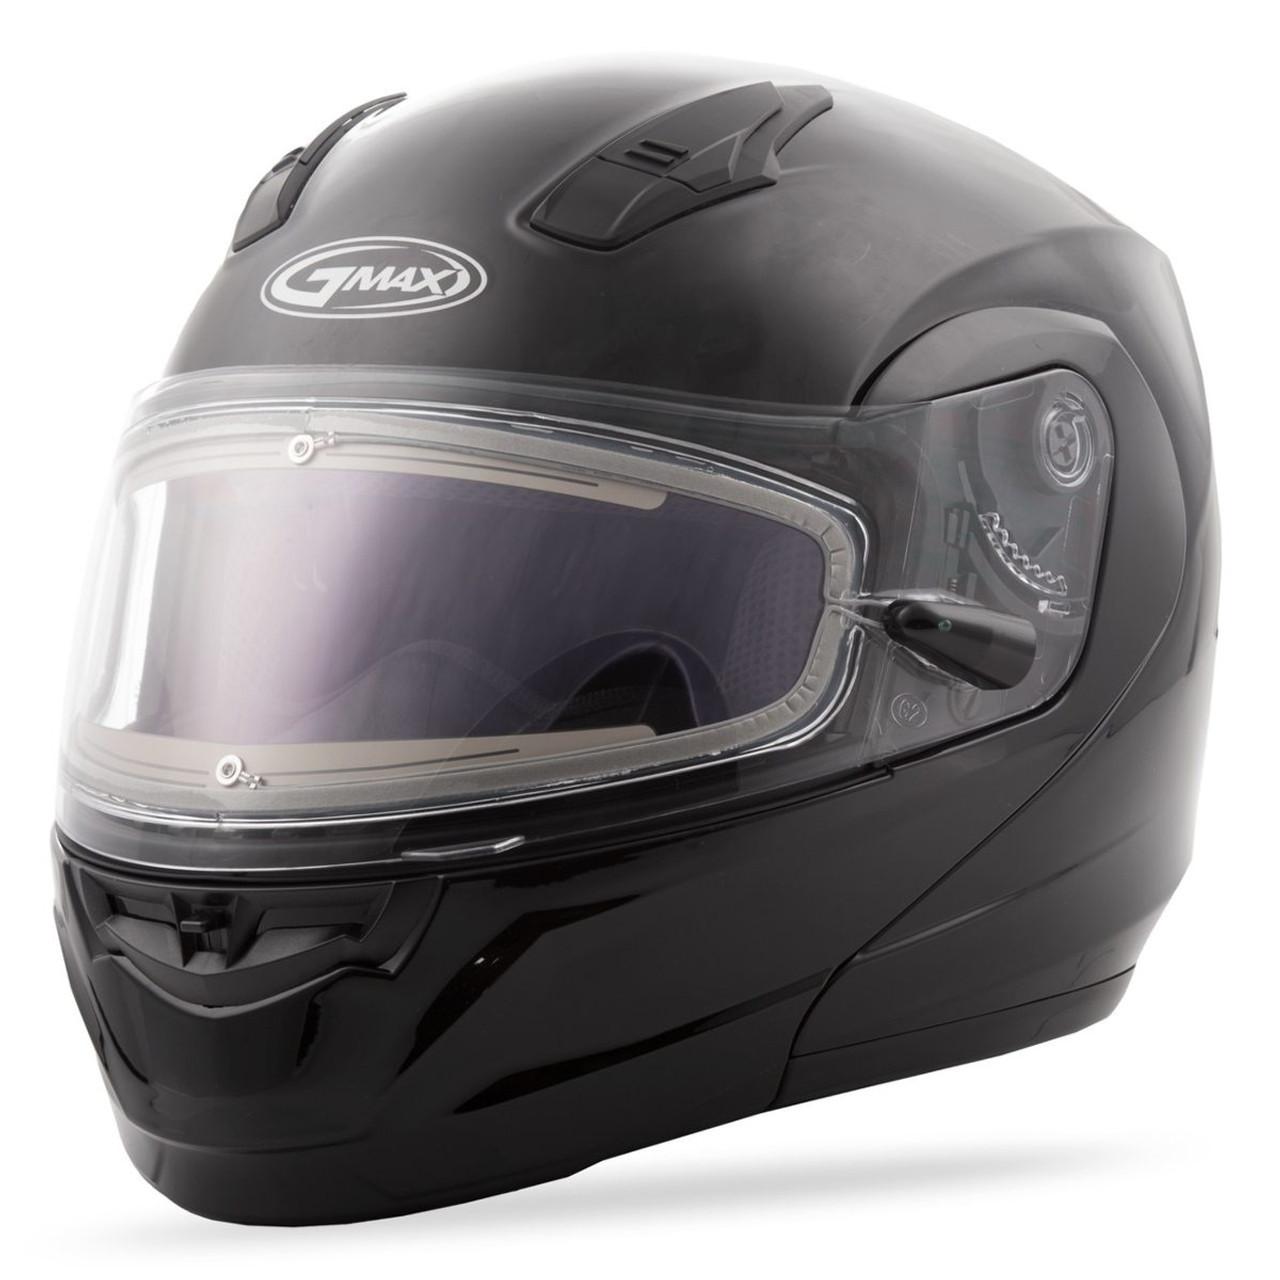 GMAX MD-04S Solid Snow Helmet W/Electric Shield Black